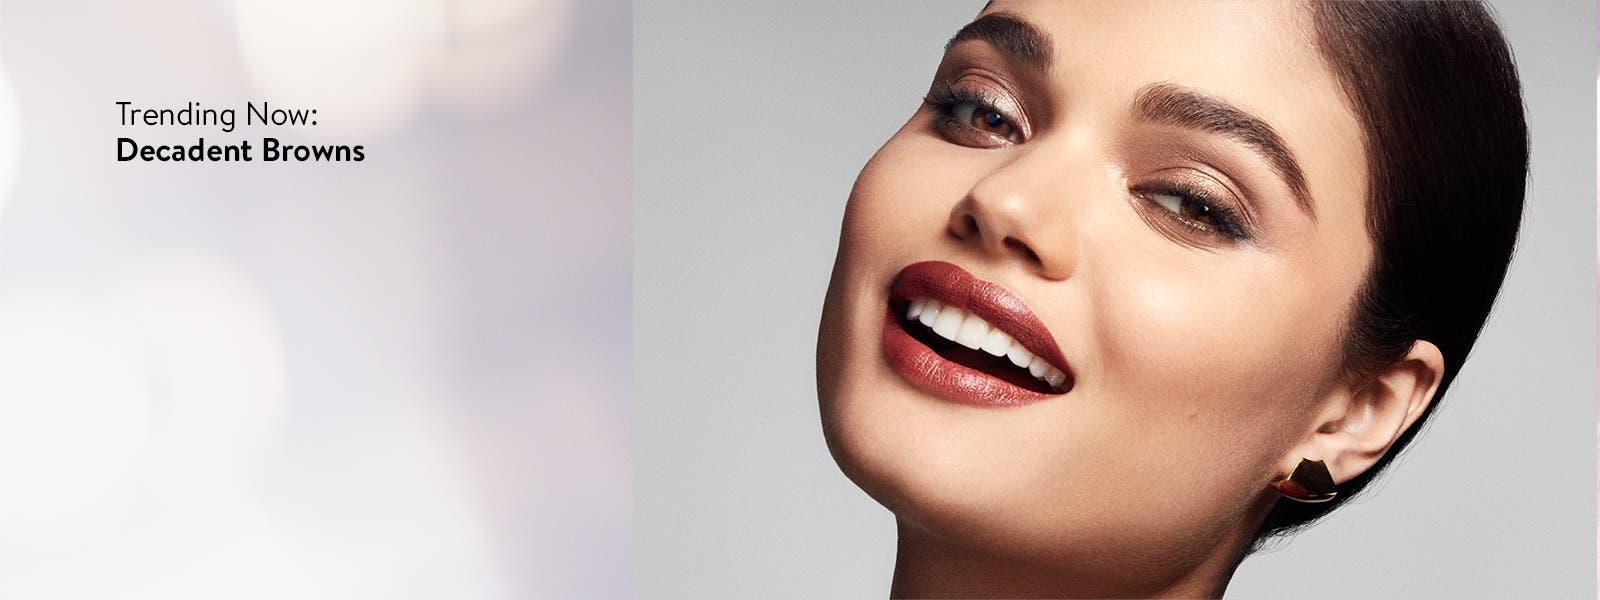 Trending now: decadent brown lip color.